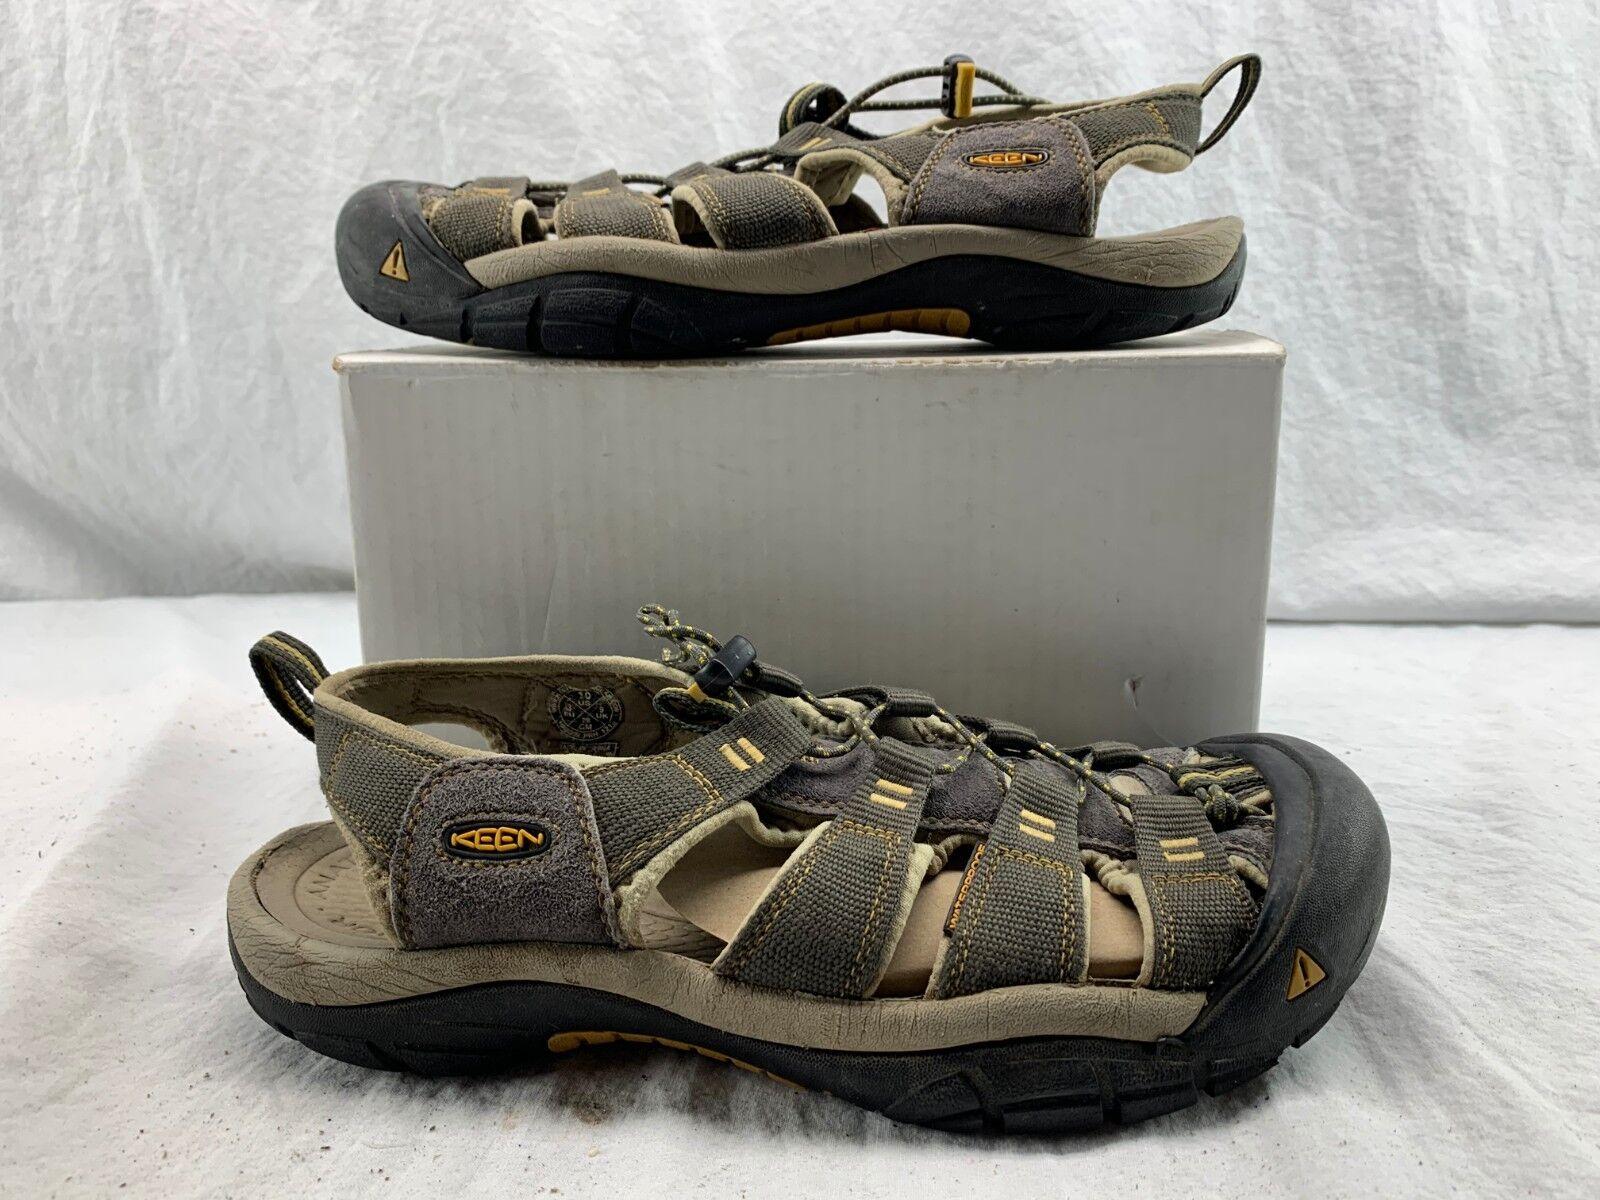 KEEN 1008399 Uomo Newport H2 Marronee Washable Sandal Sandal Sandal scarpe Dimensione 10 8ef2d0